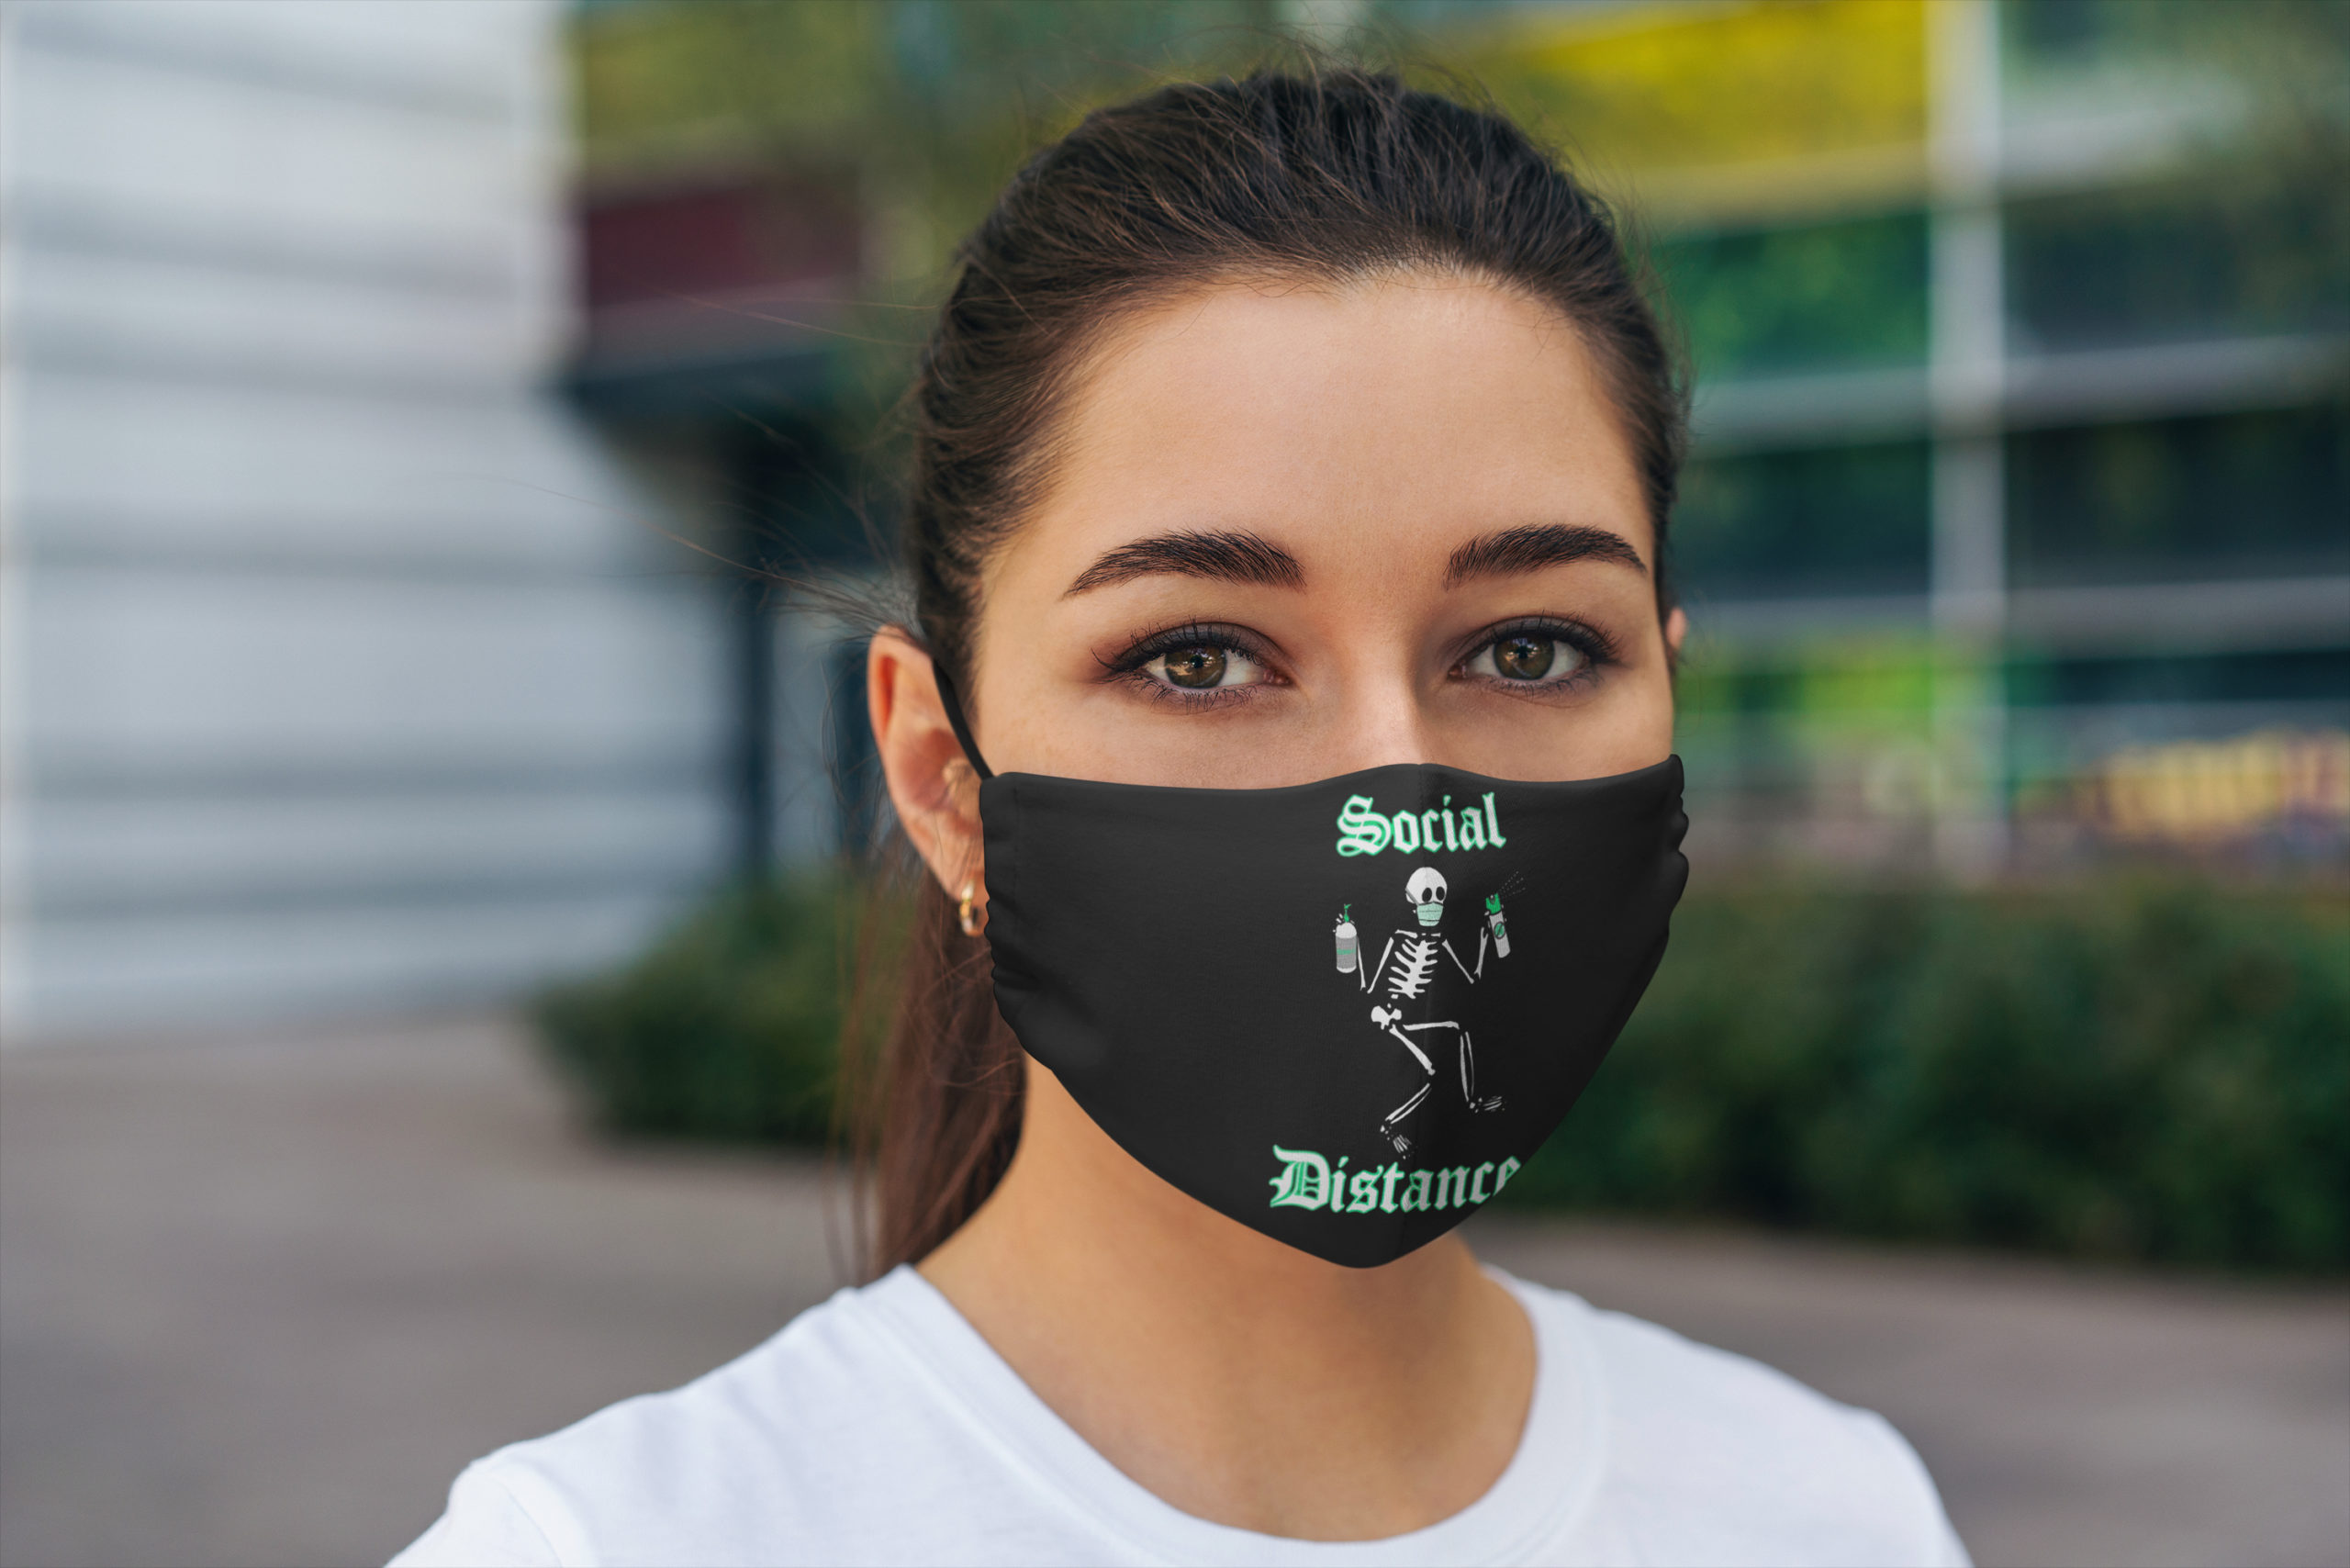 Social distance skeleton all over printed face mask 4